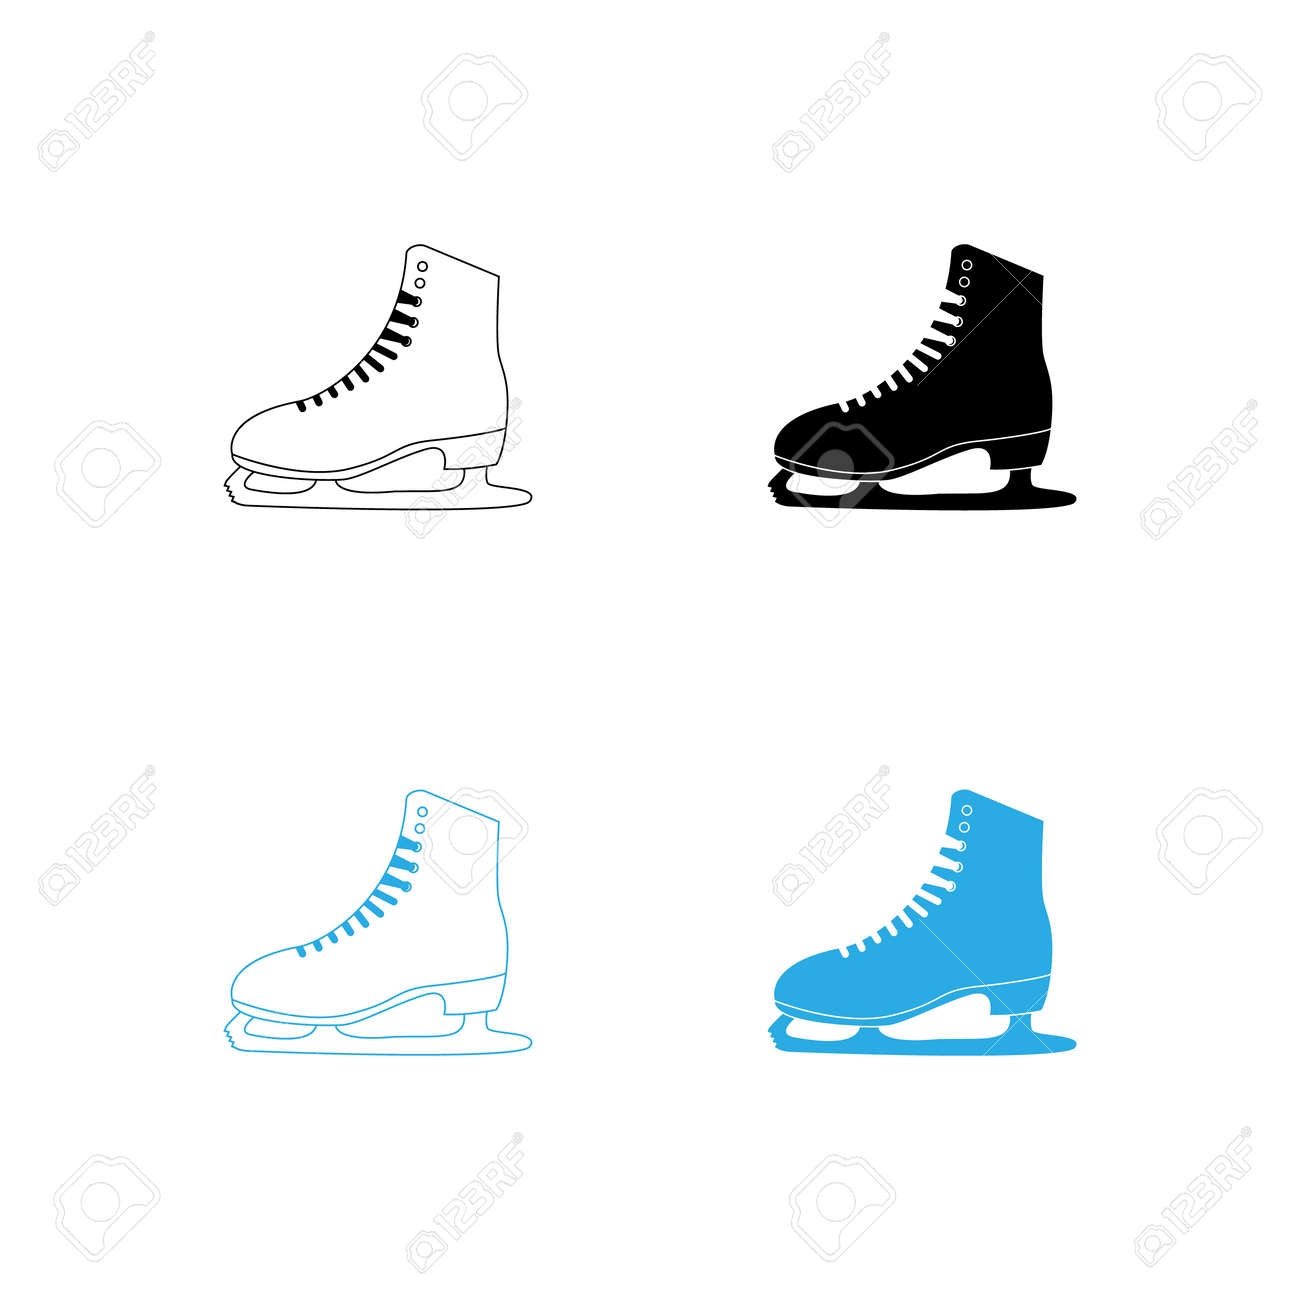 winter sports ice skating shoes vector illustration flat design - 167138310